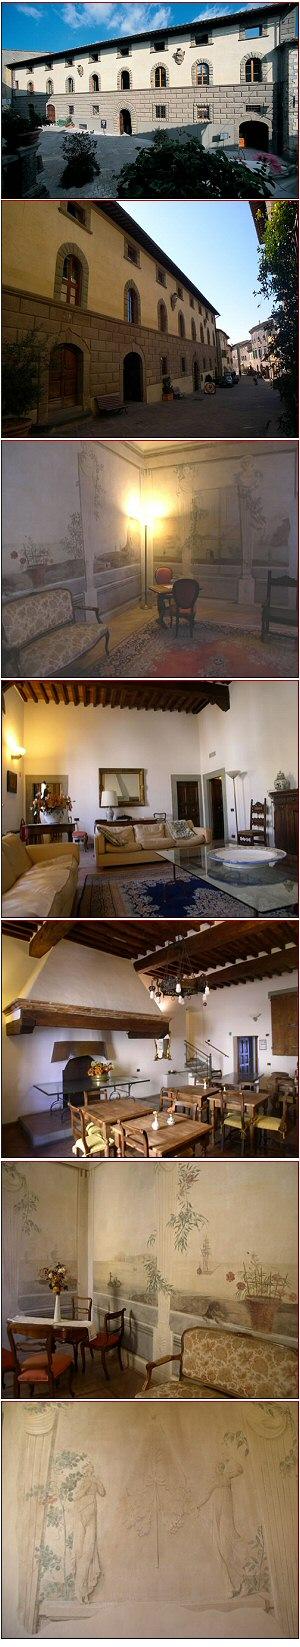 Hotel Palazzo Squarcialupi Hotel Castellina in Chianti